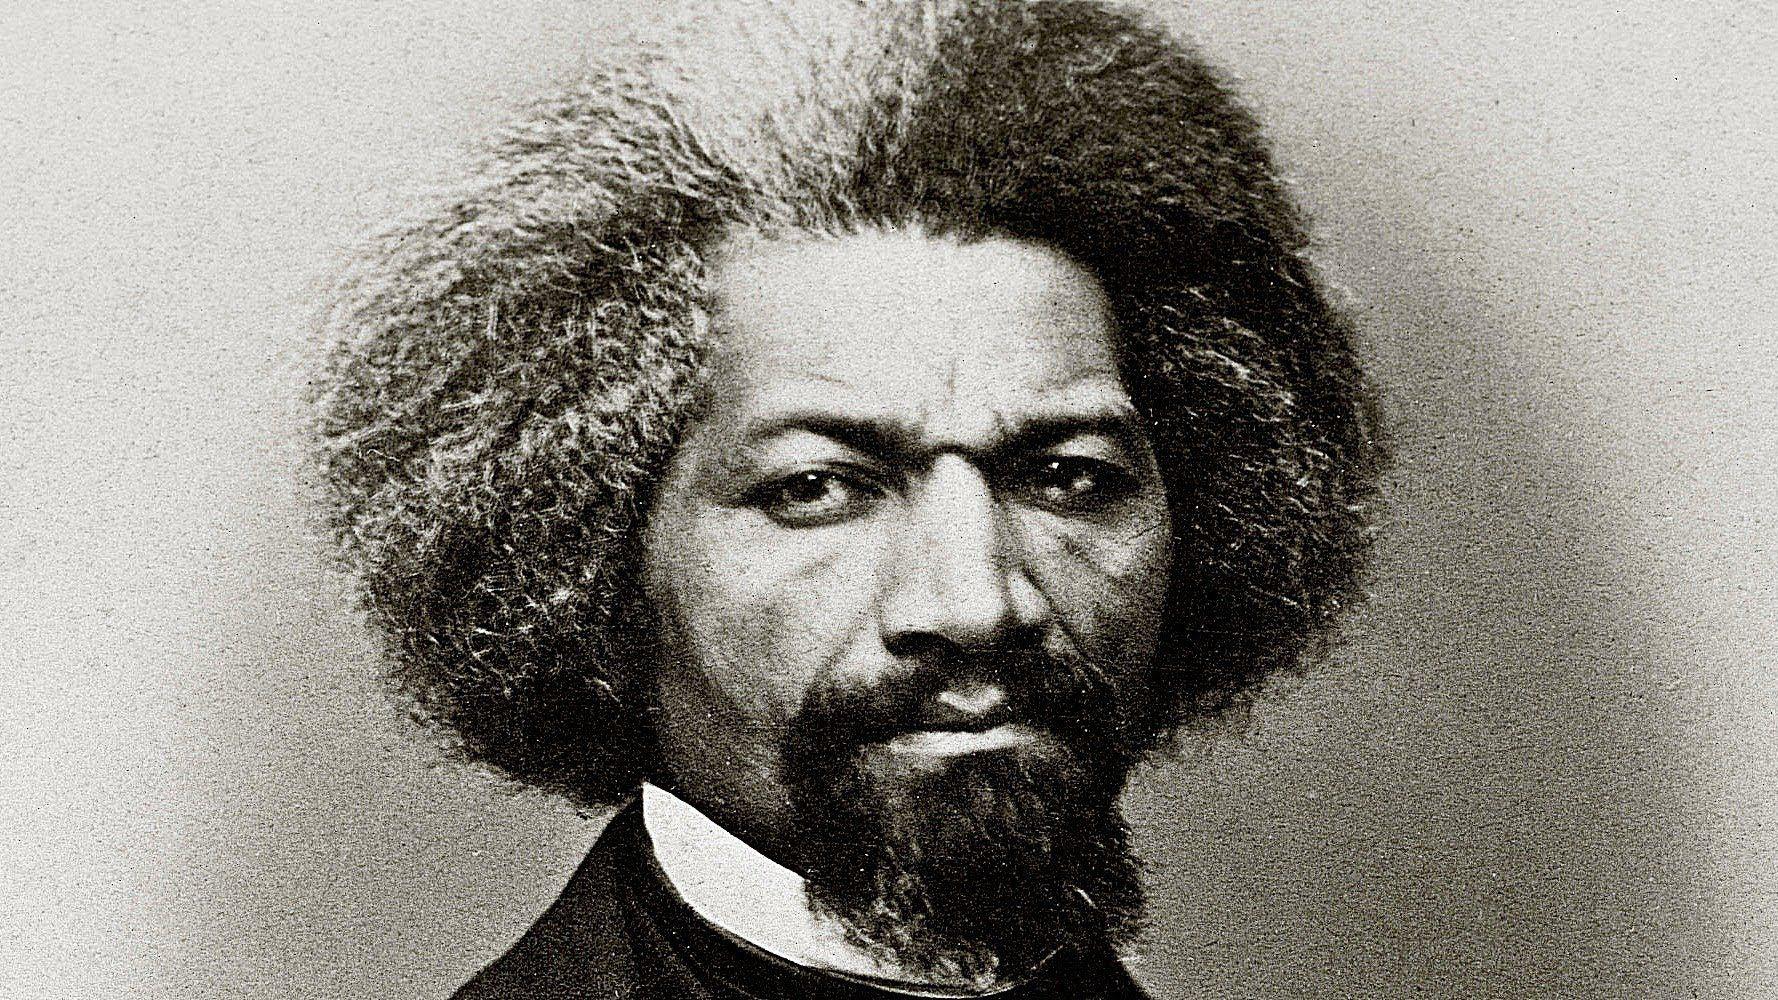 Biography Frederick Douglass